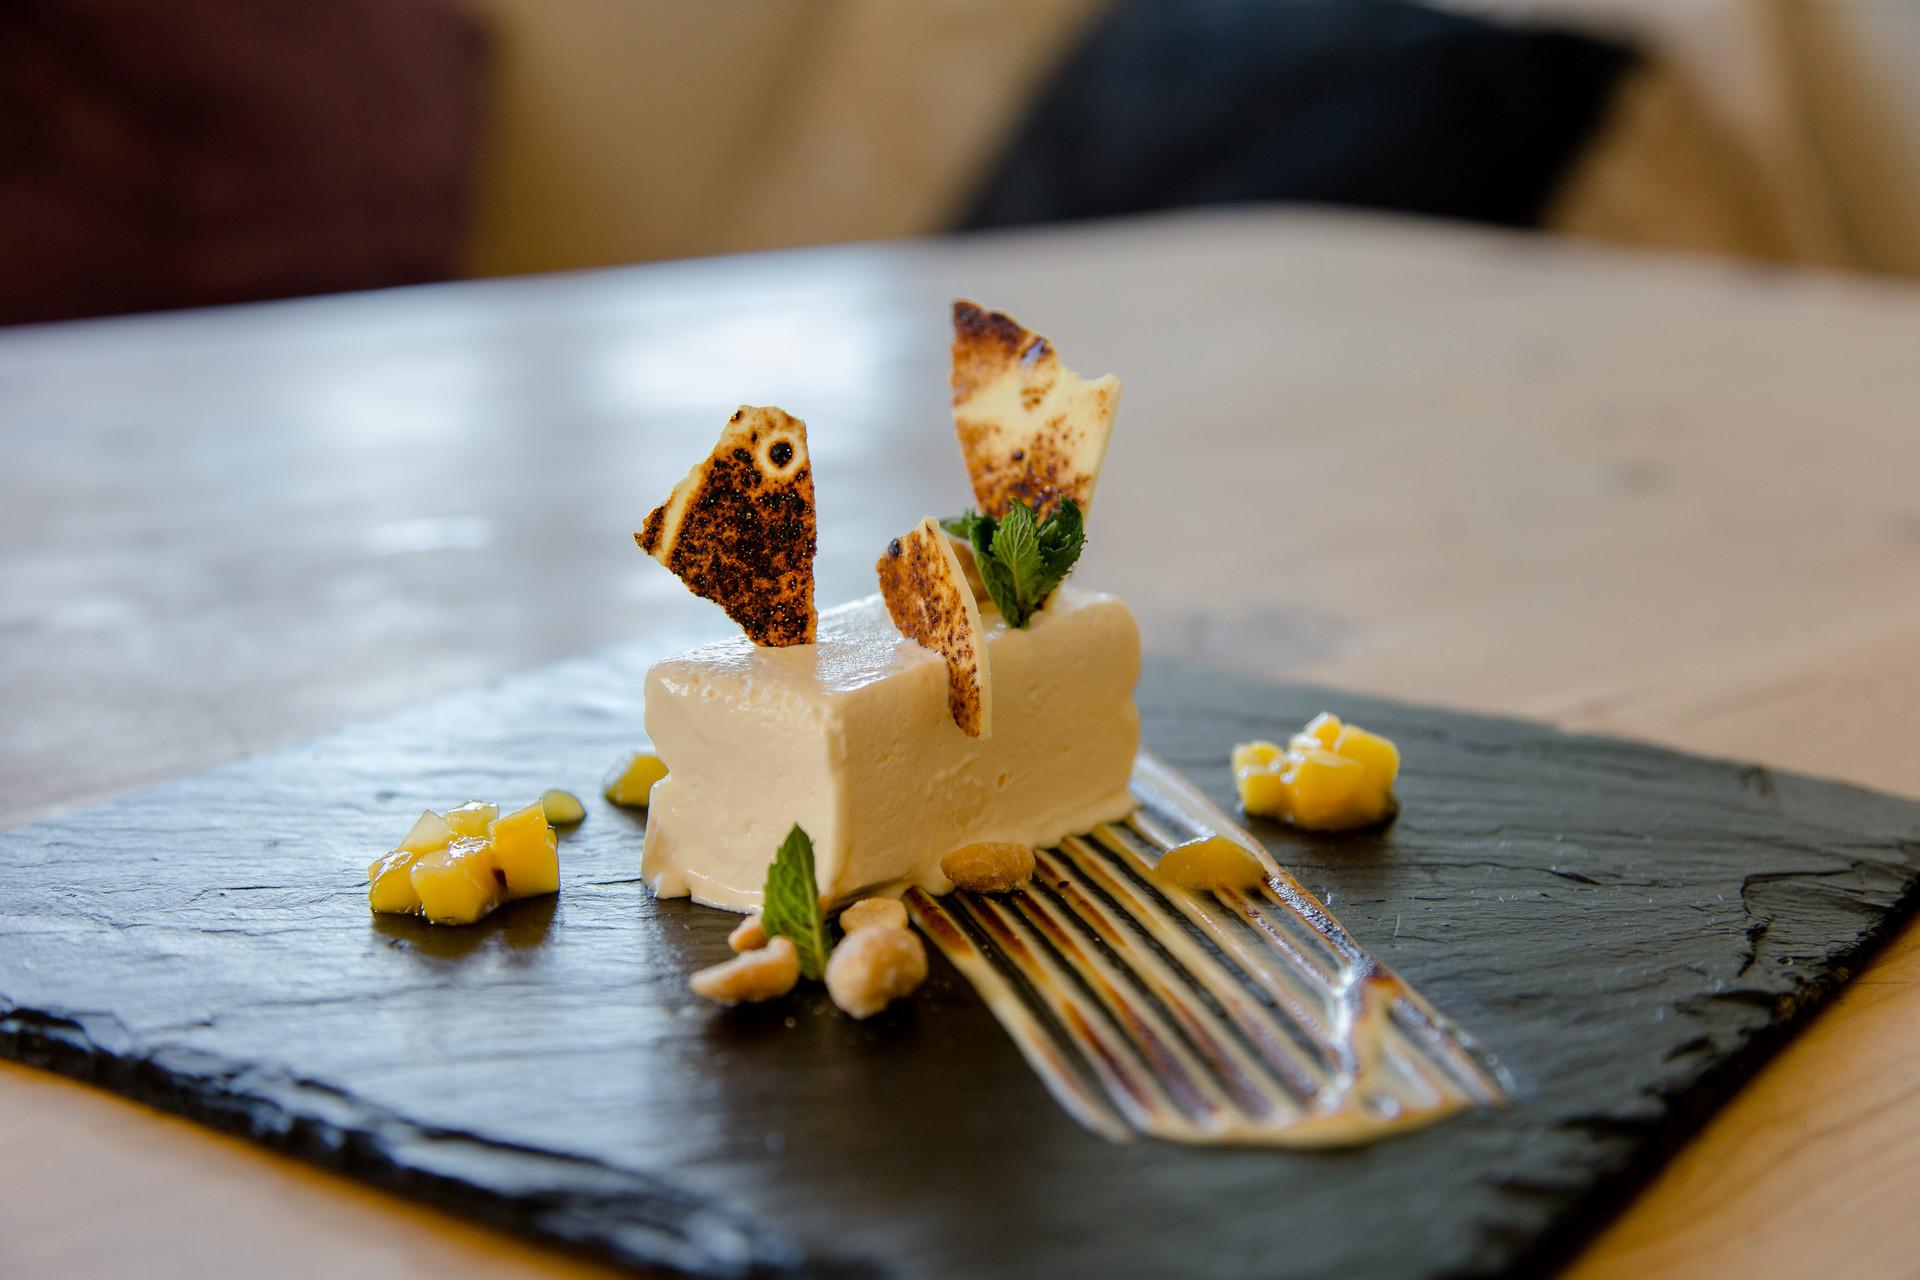 Isle of Wight Food Photographer